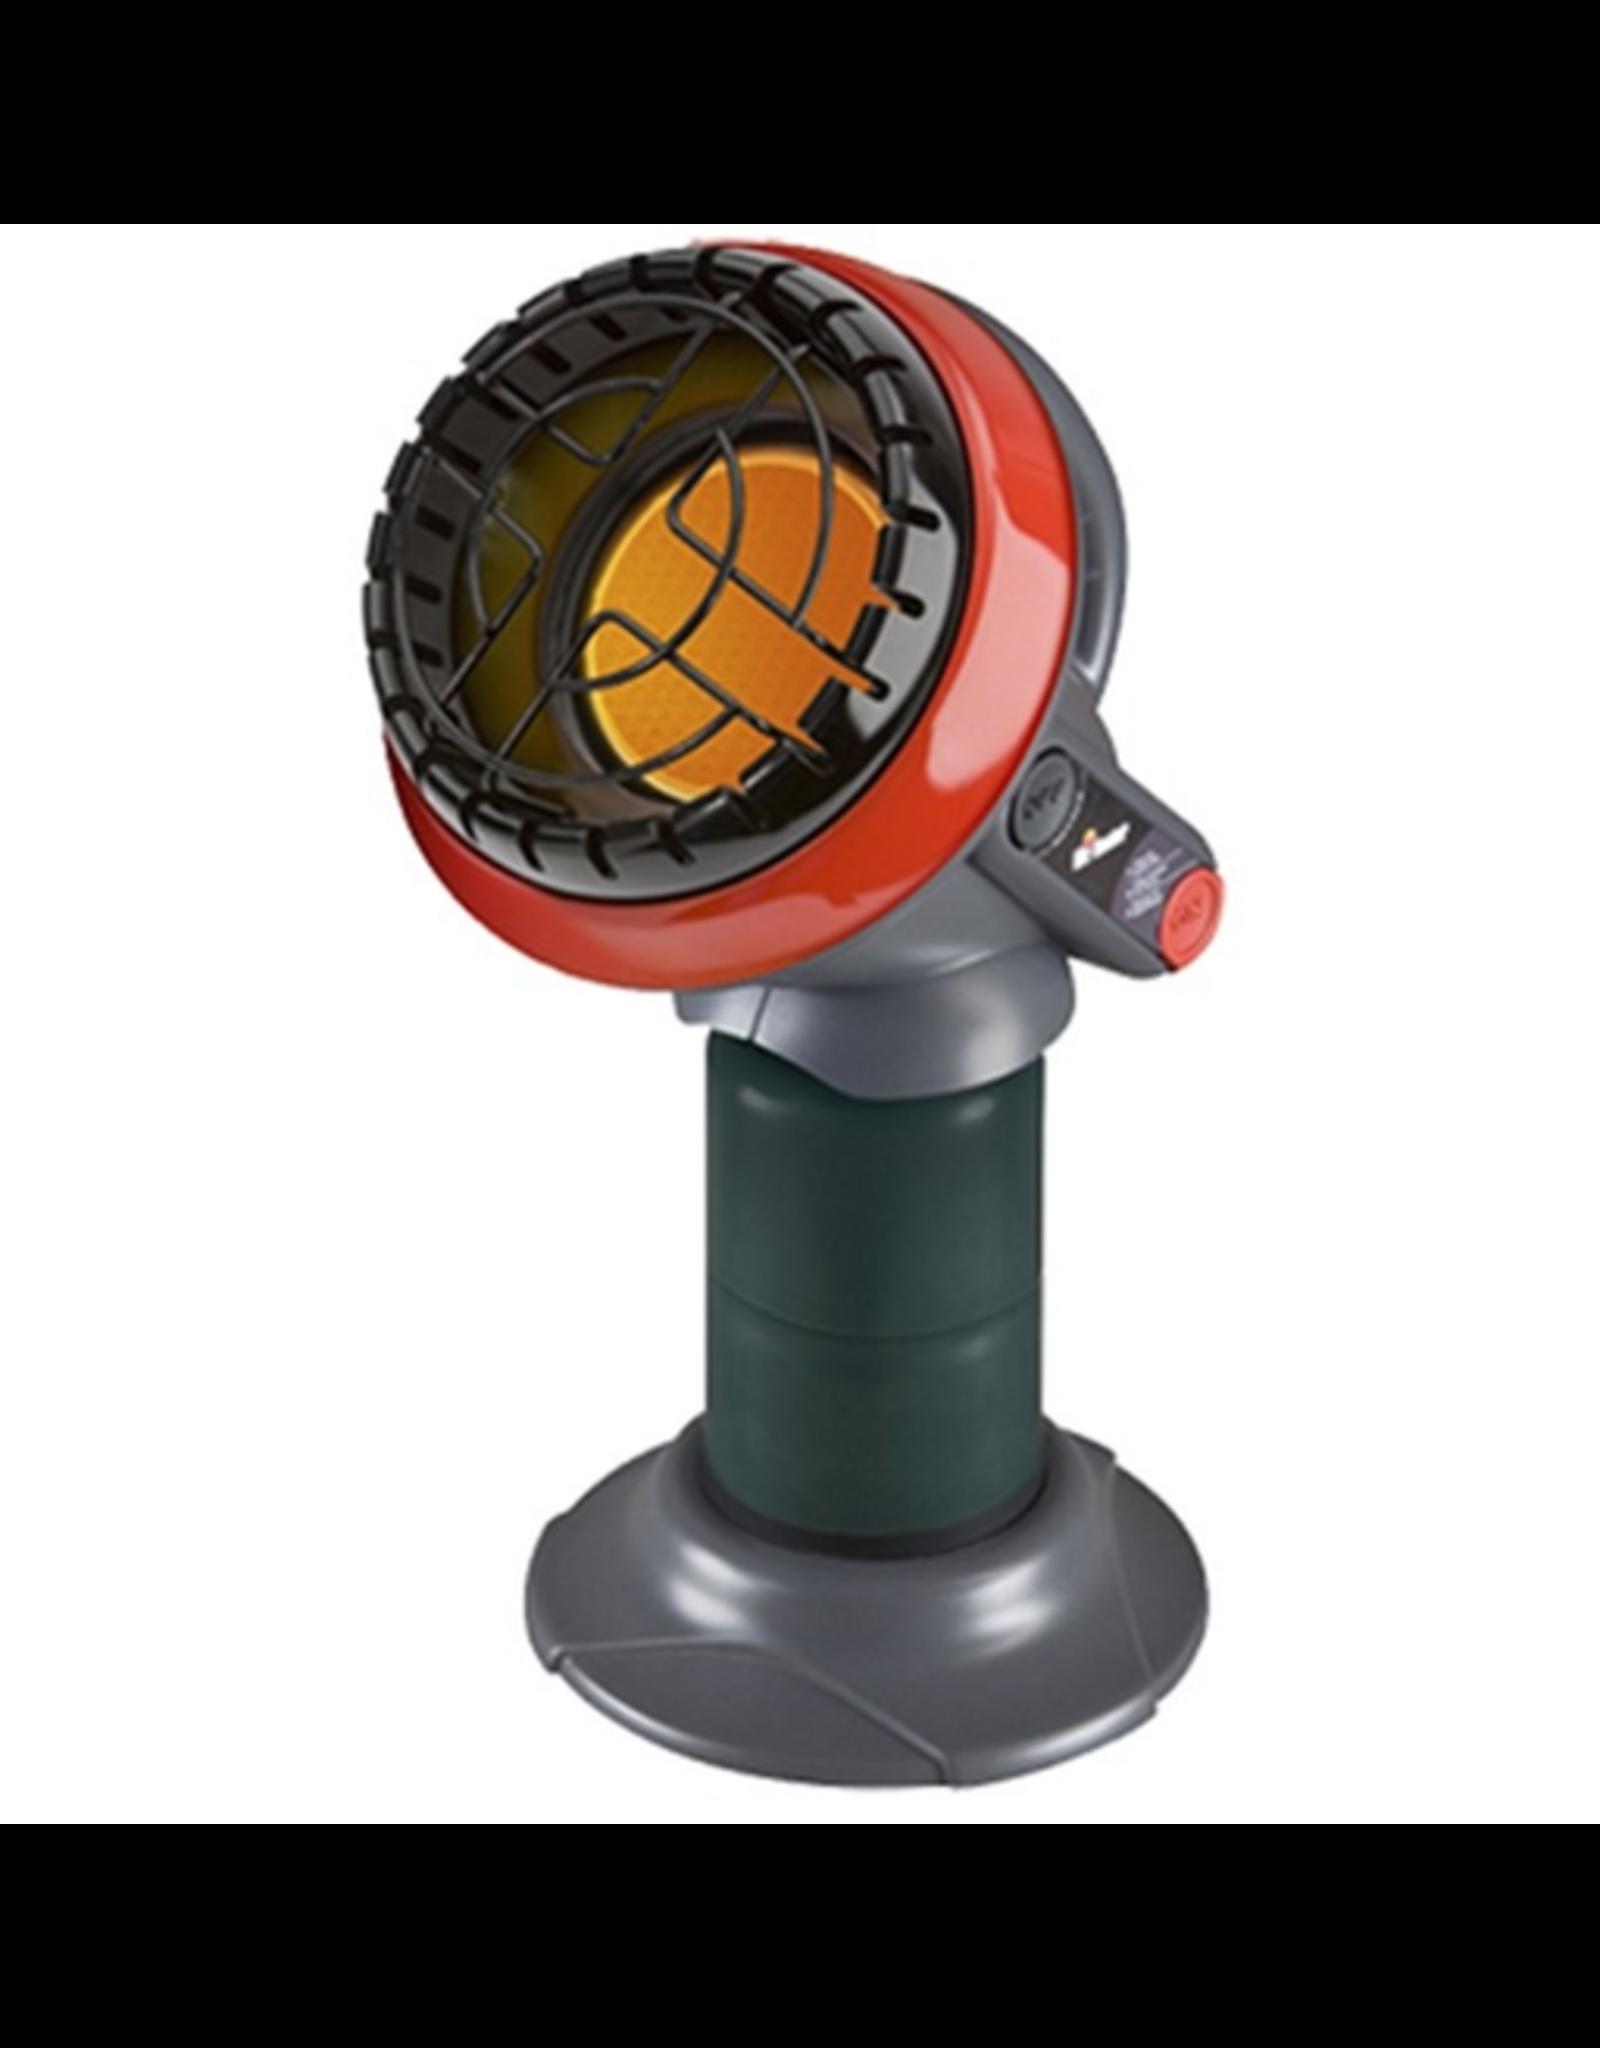 Mr. Heater Mr. Heater Little Buddy Portable Propane Heater, 3800 BTU